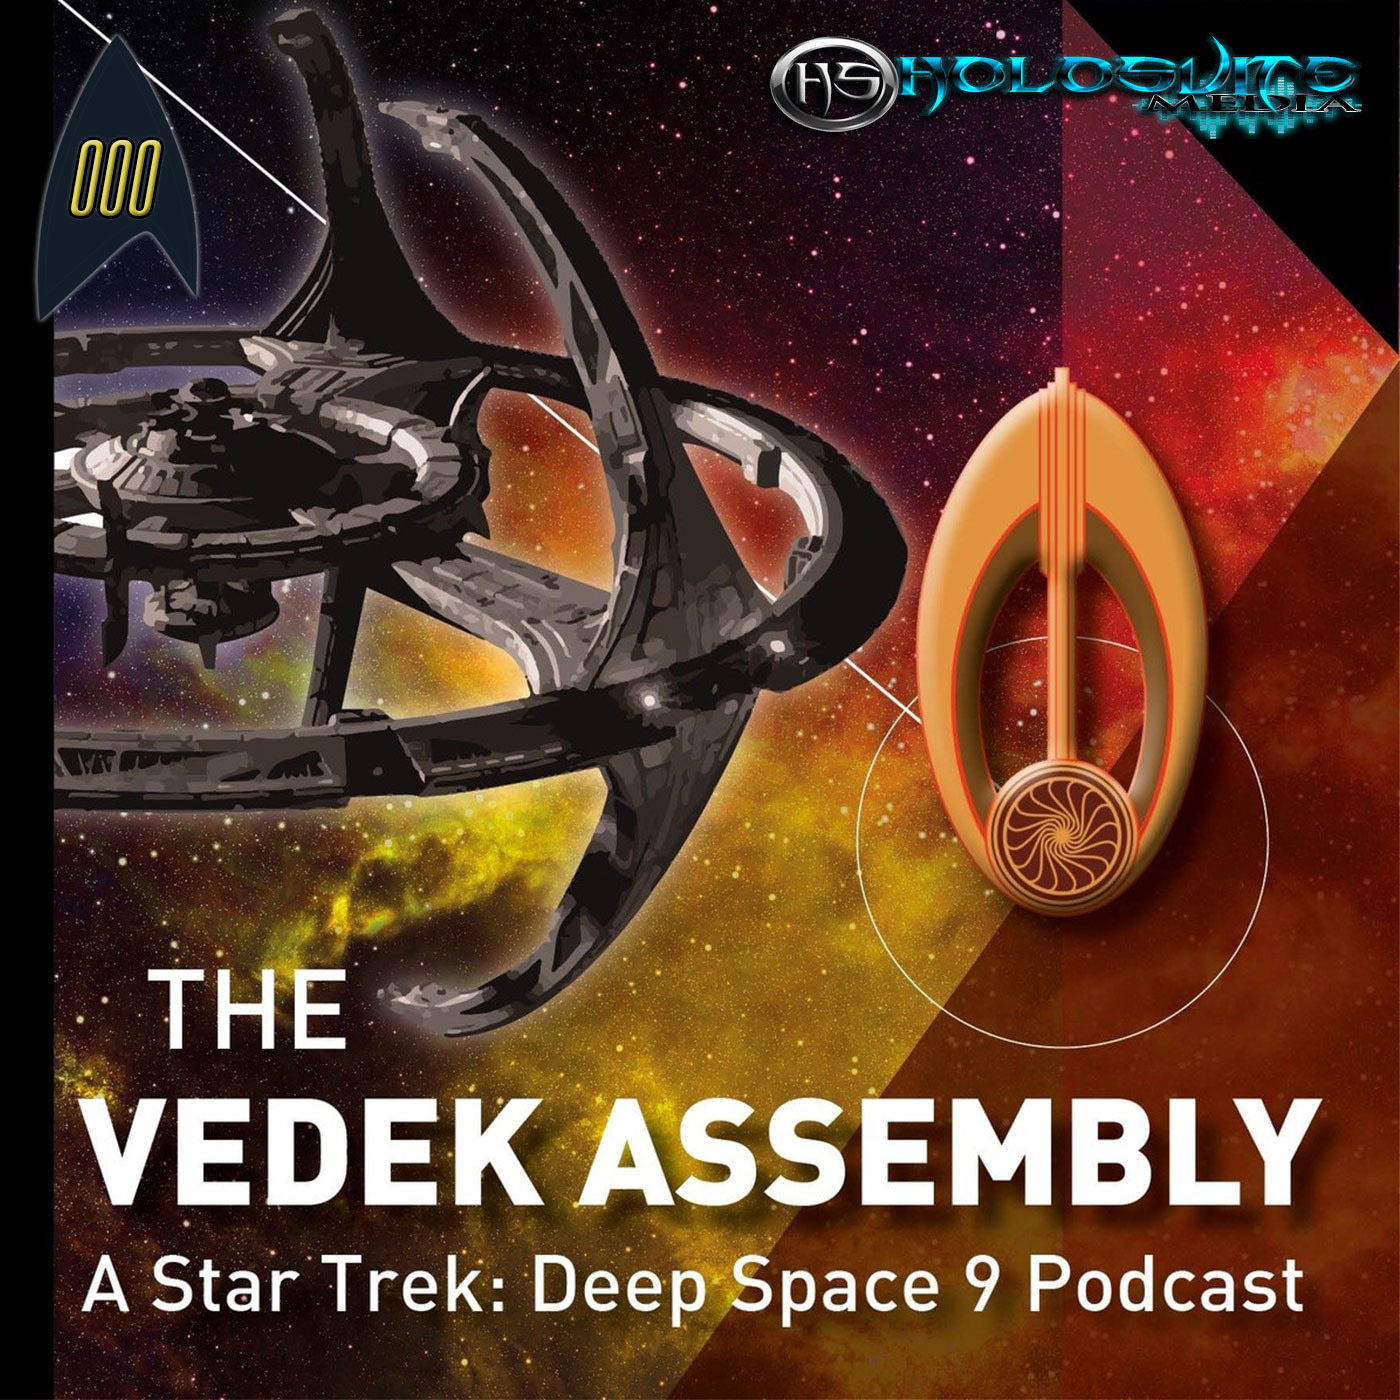 The Vedek Assembly Podcast Episode 0